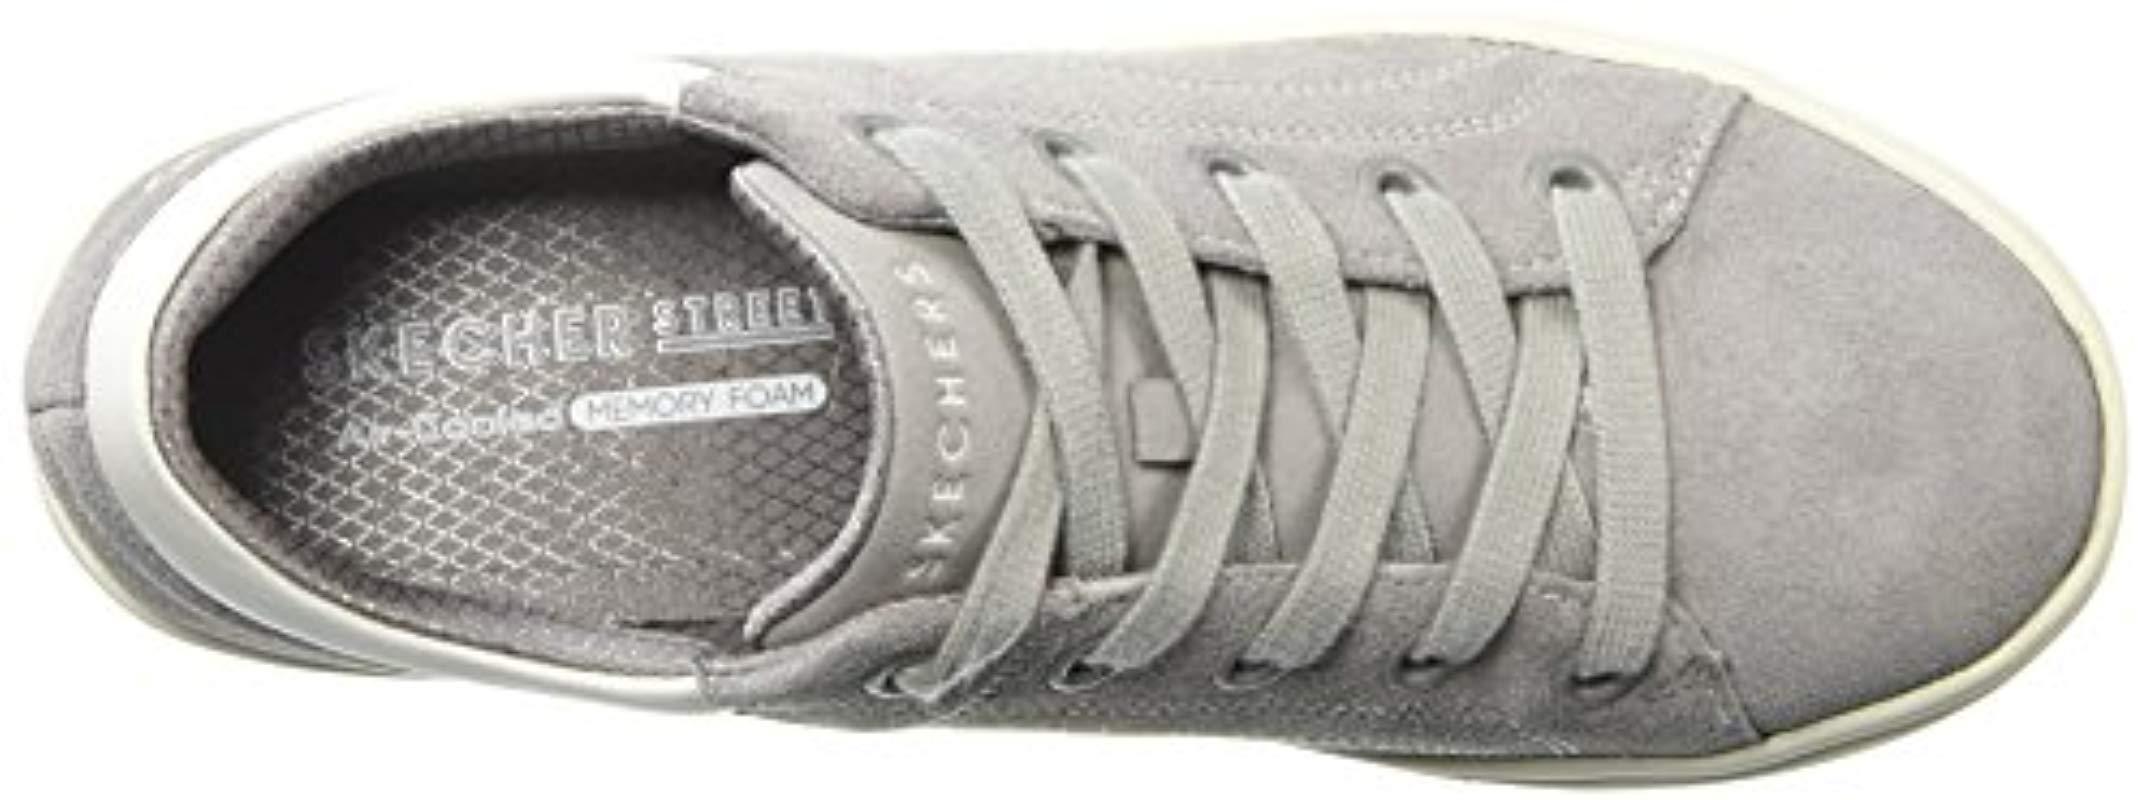 Skechers Suede Sports Shoes in Grey (Grey)